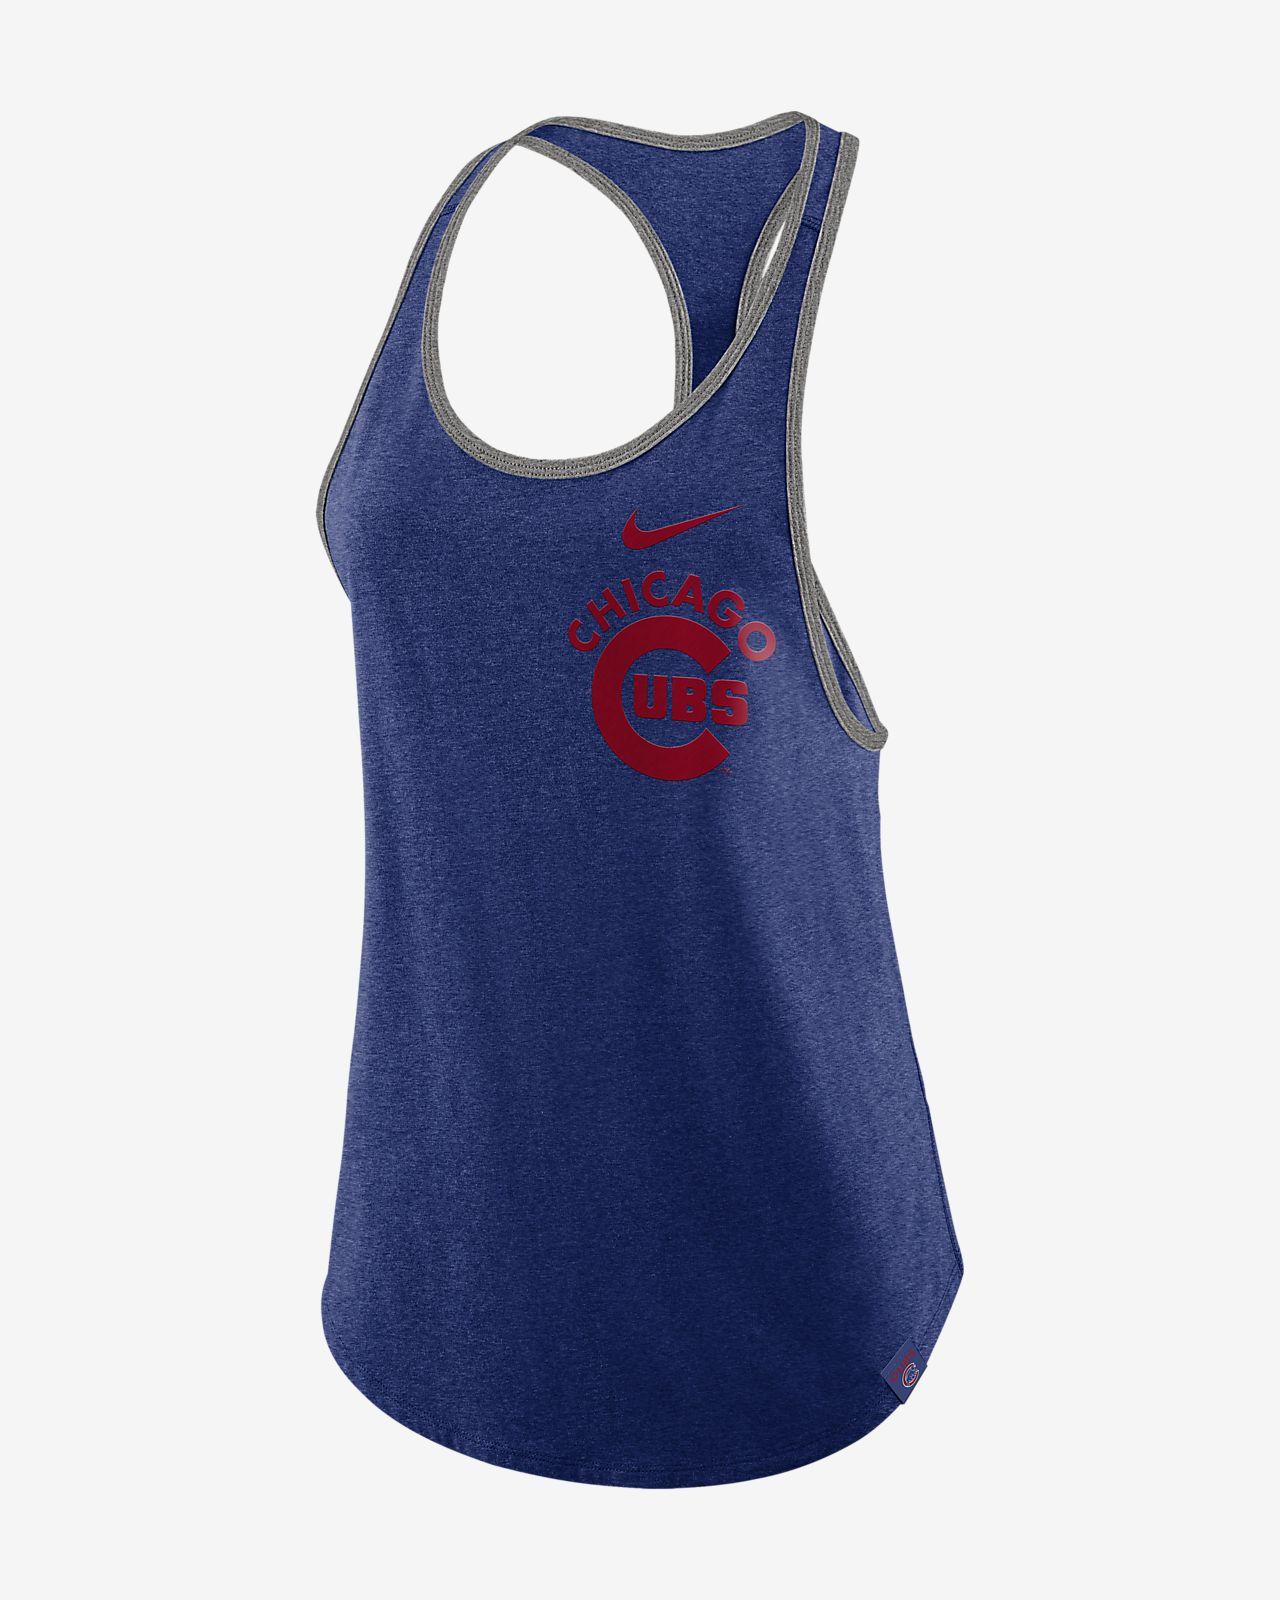 Nike Tri Racerback (MLB Cubs) Women s Tank Top. Nike.com 51ba008118